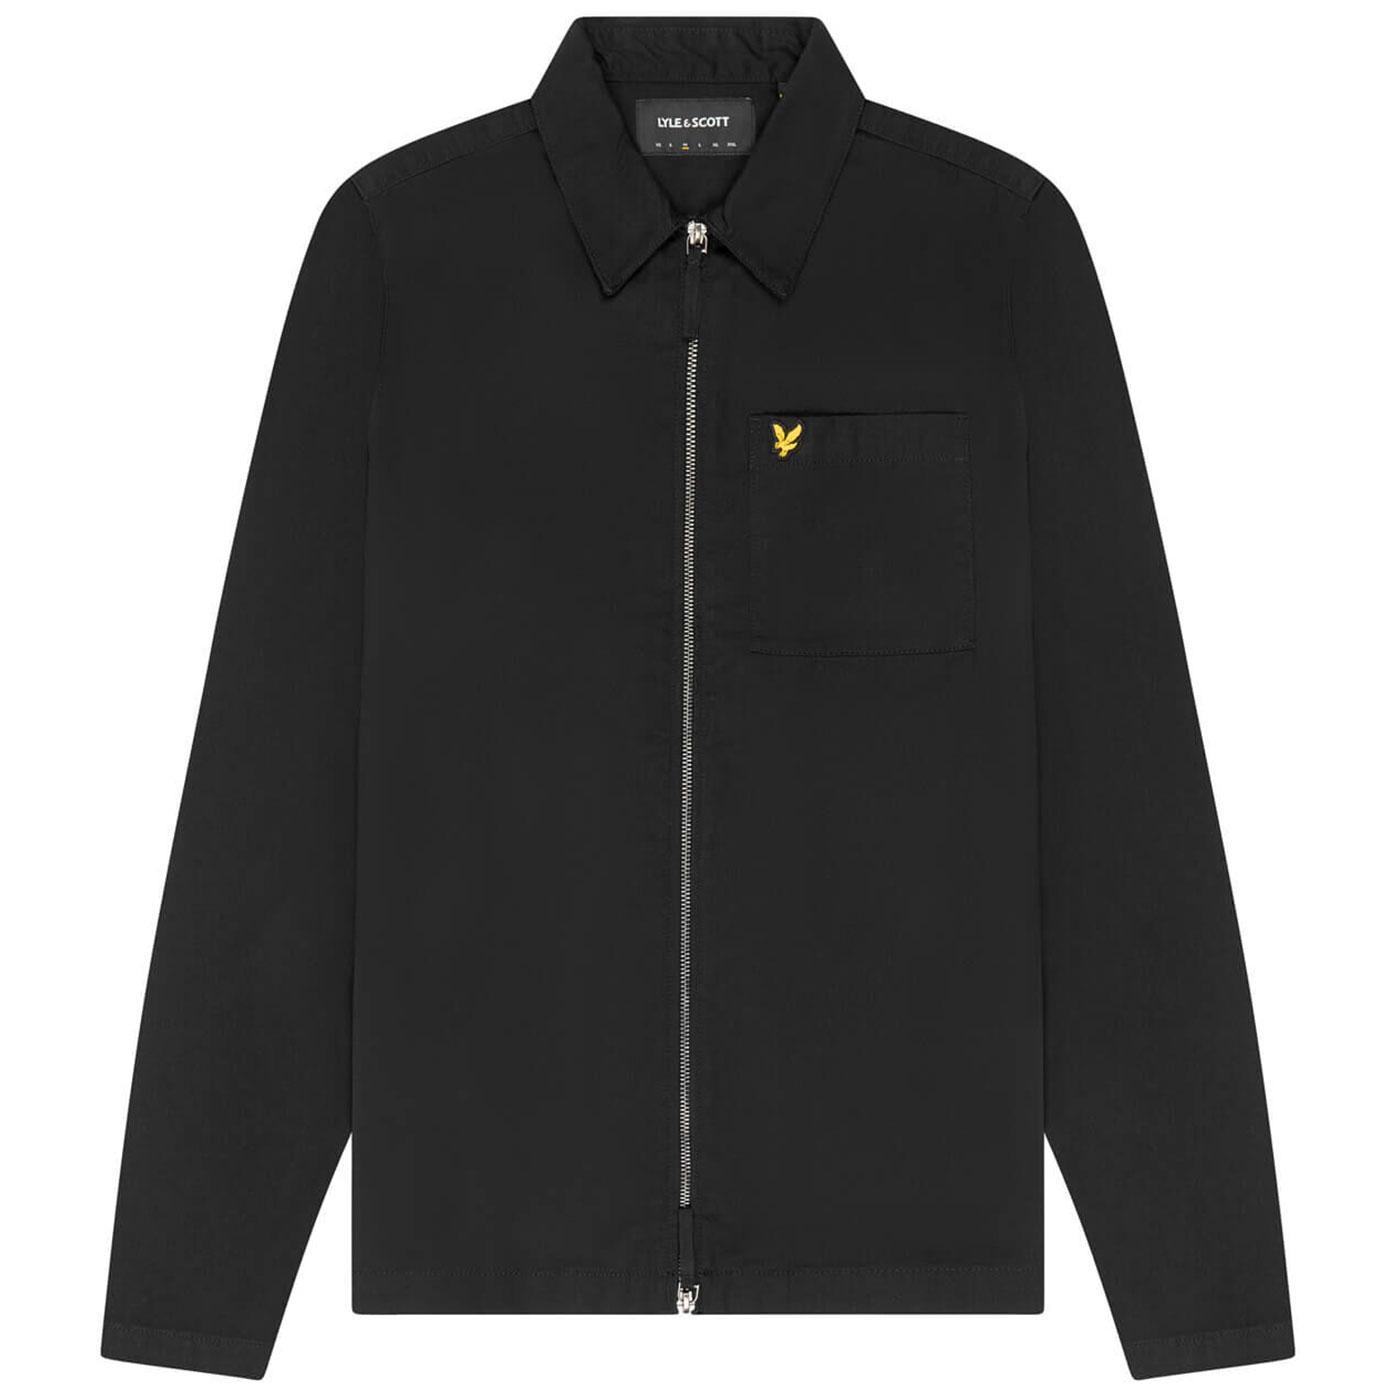 LYLE & SCOTT Mod Zip Through Twill Overshirt (JB)